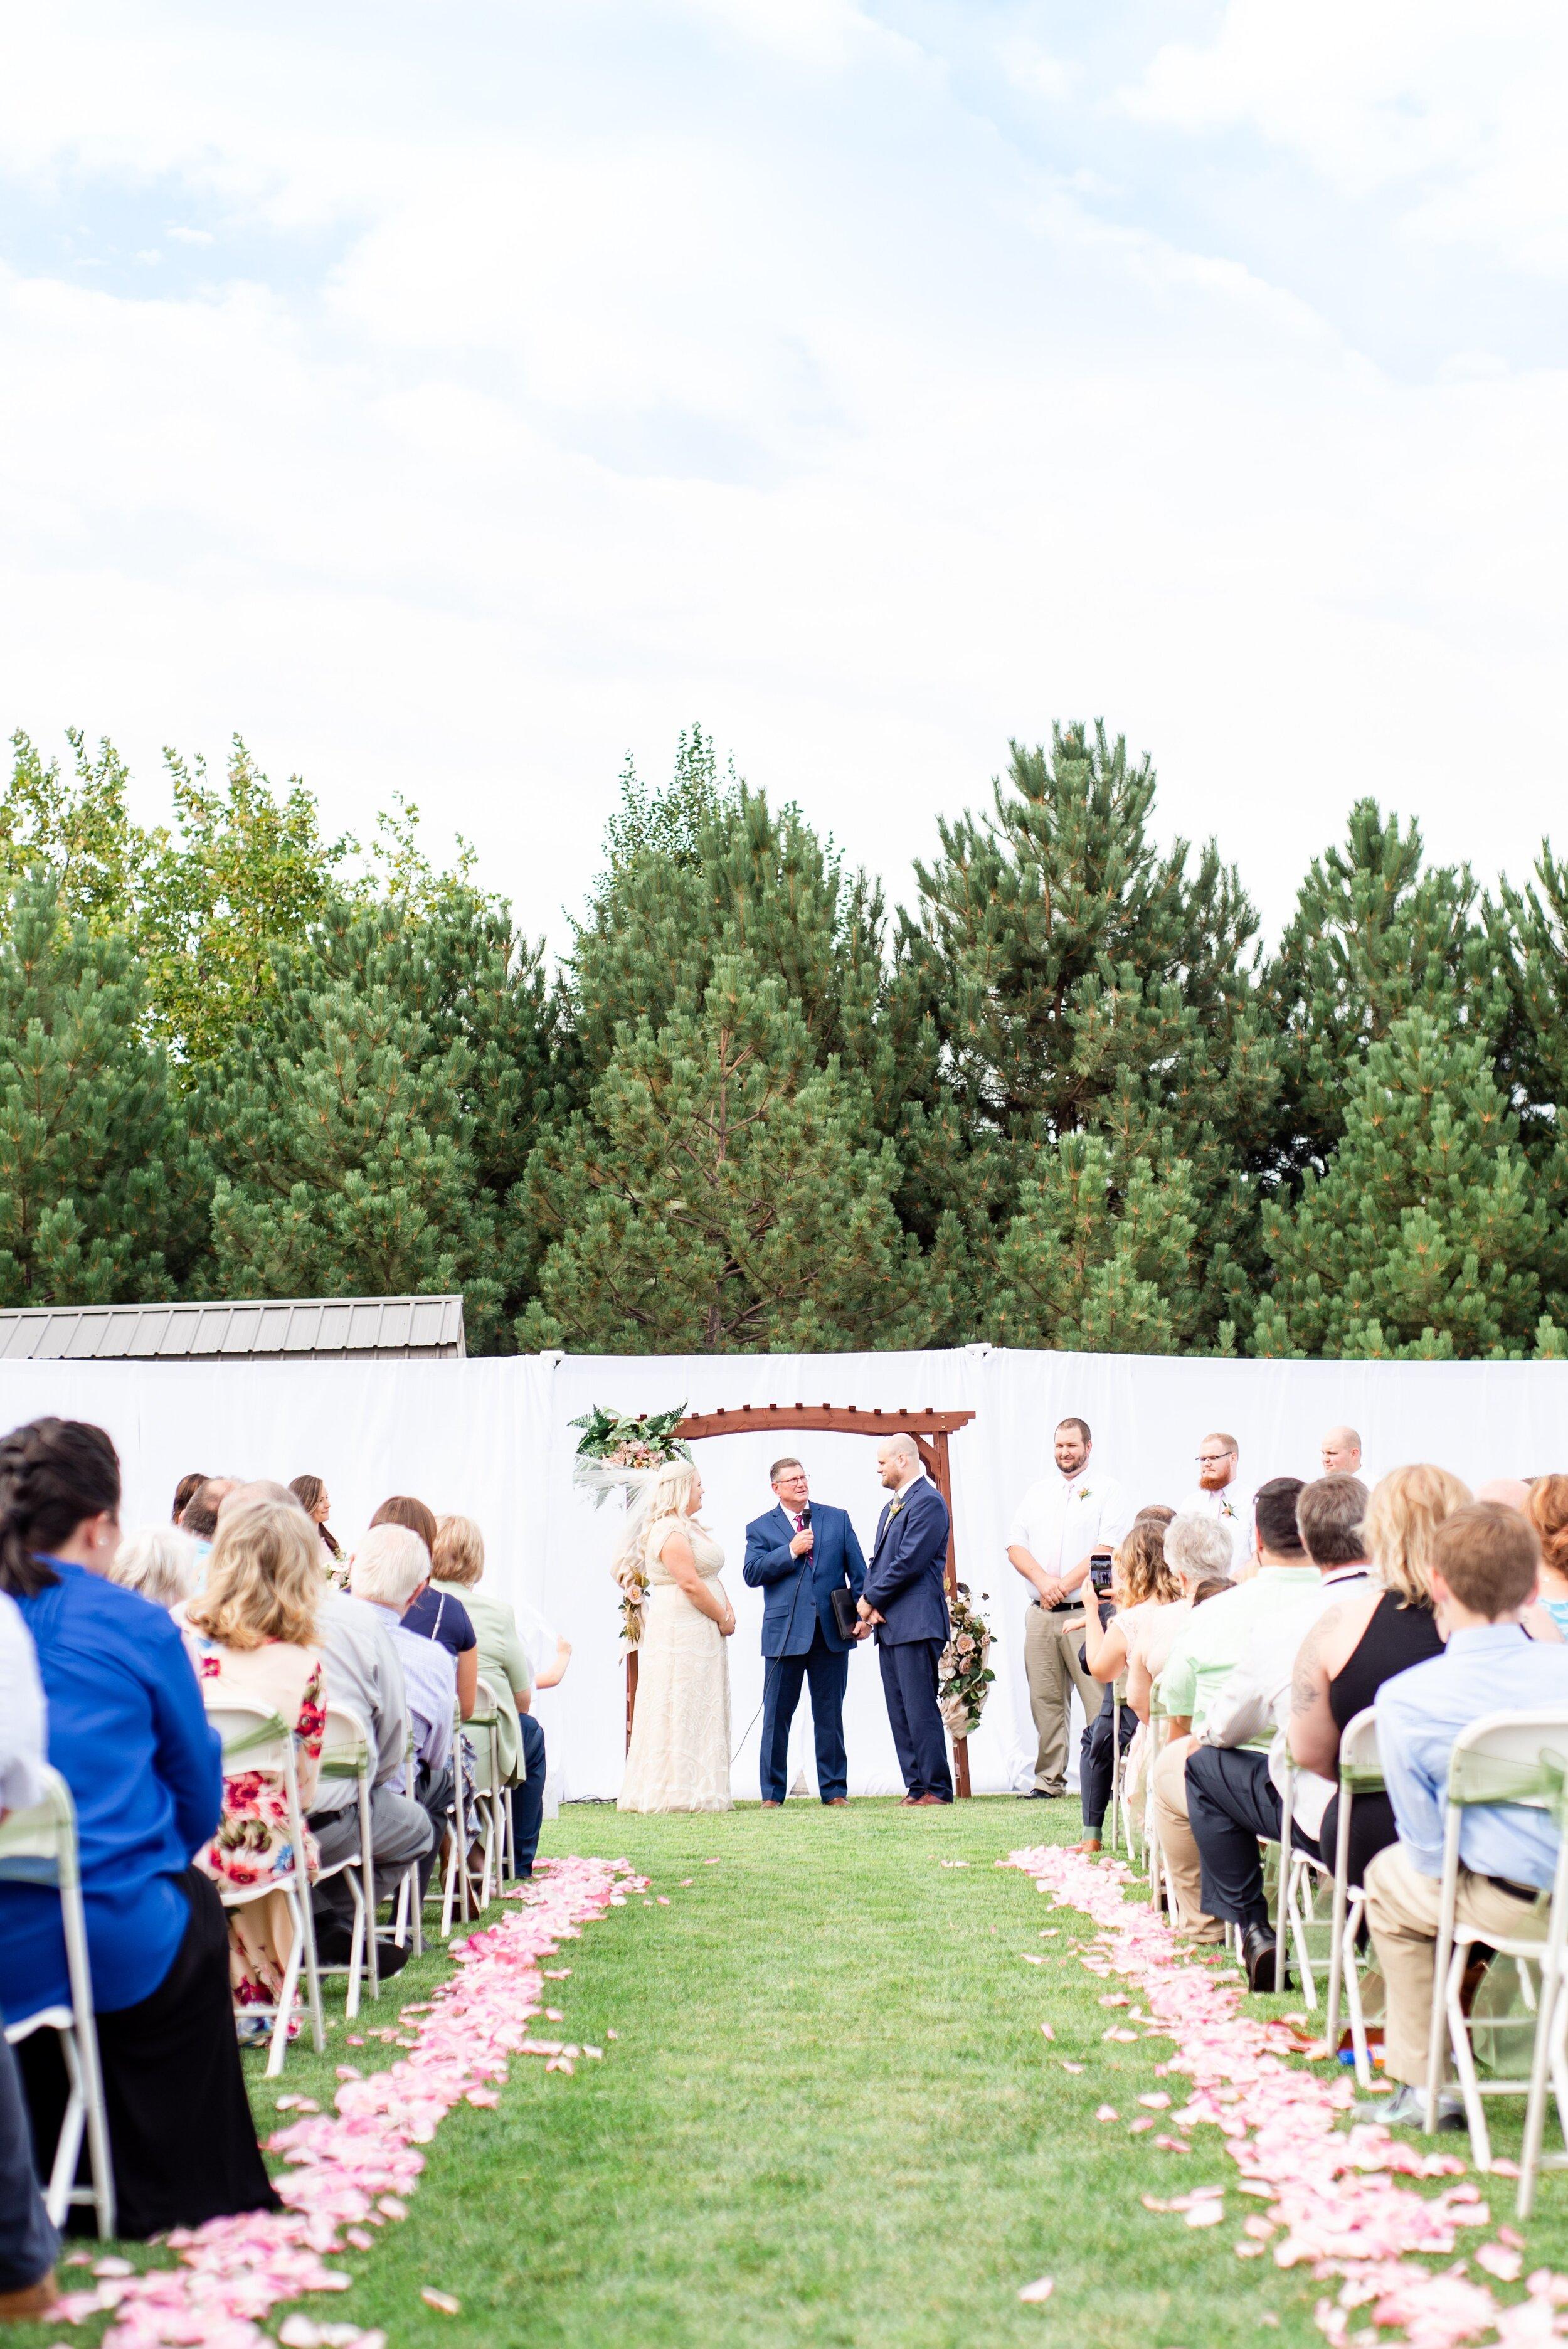 Backyard Wedding Altar- Tri Cities Wedding Photographer - Morgan Tayler Photo & Design - Tri Cities Washington Backyard Wedding